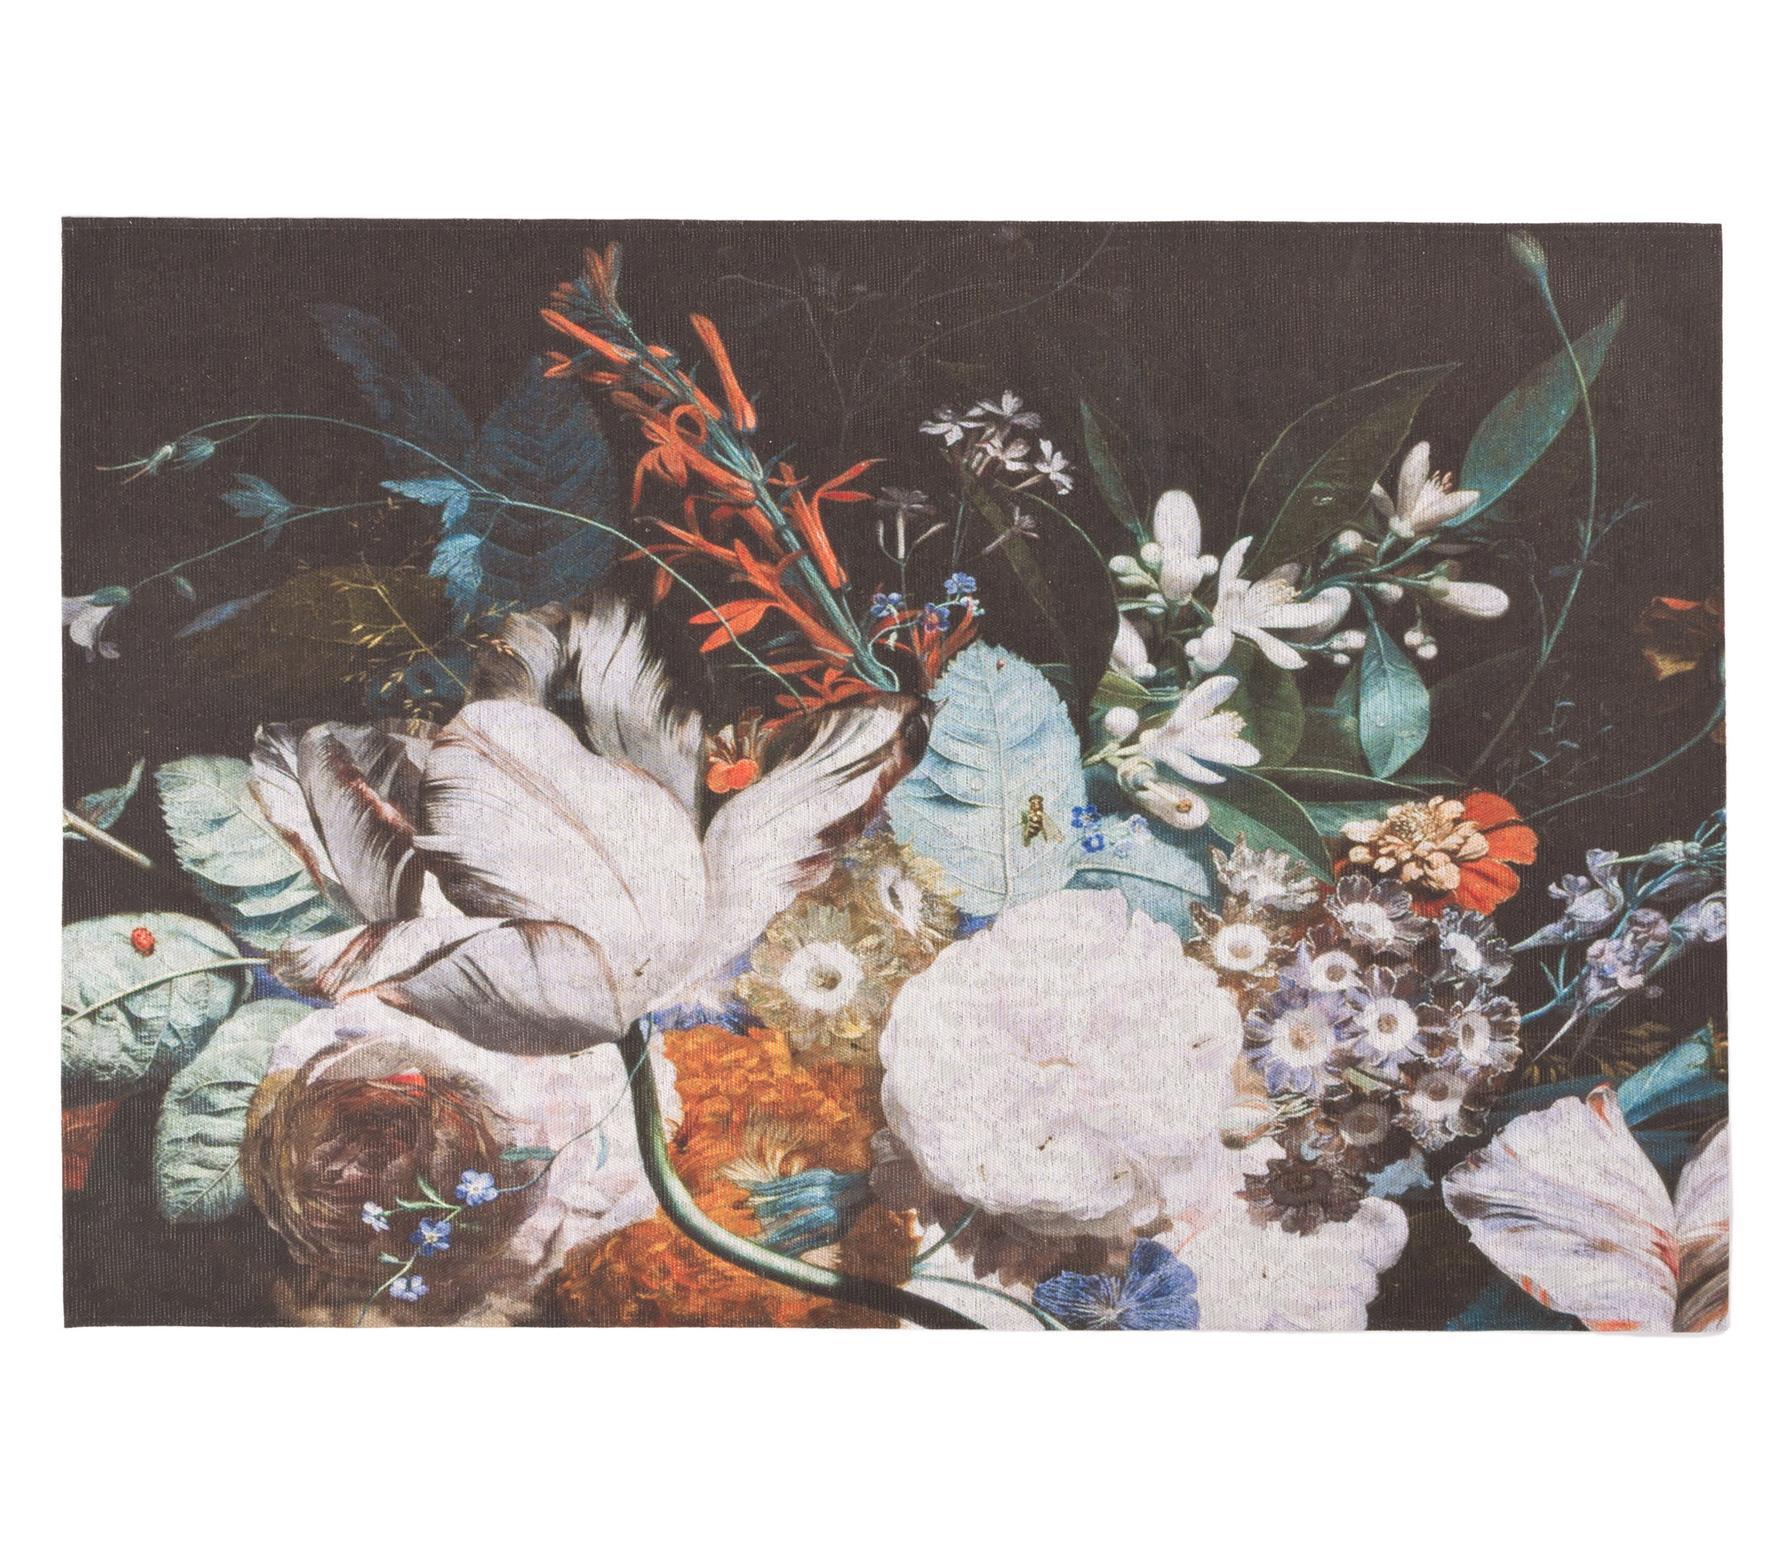 Luisa vloerkleed multicolor div. afmetingen 155x230 cm